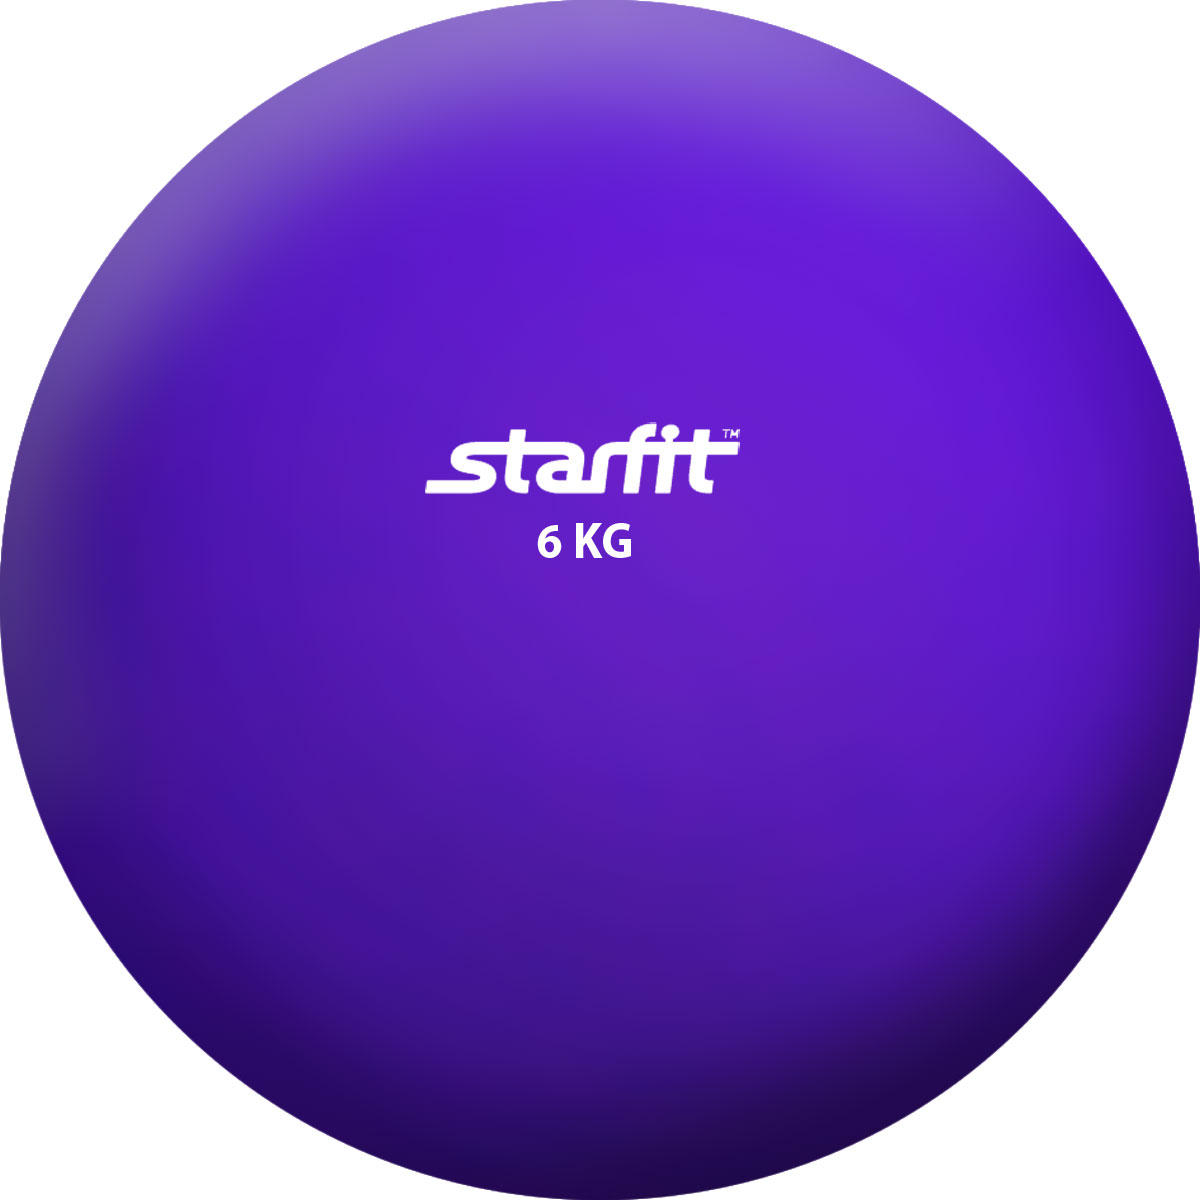 Медицинбол Starfit GB-703, цвет: фиолетовый, 6 кг эспандеры starfit эспандер starfit es 702 power twister черный 50 кг